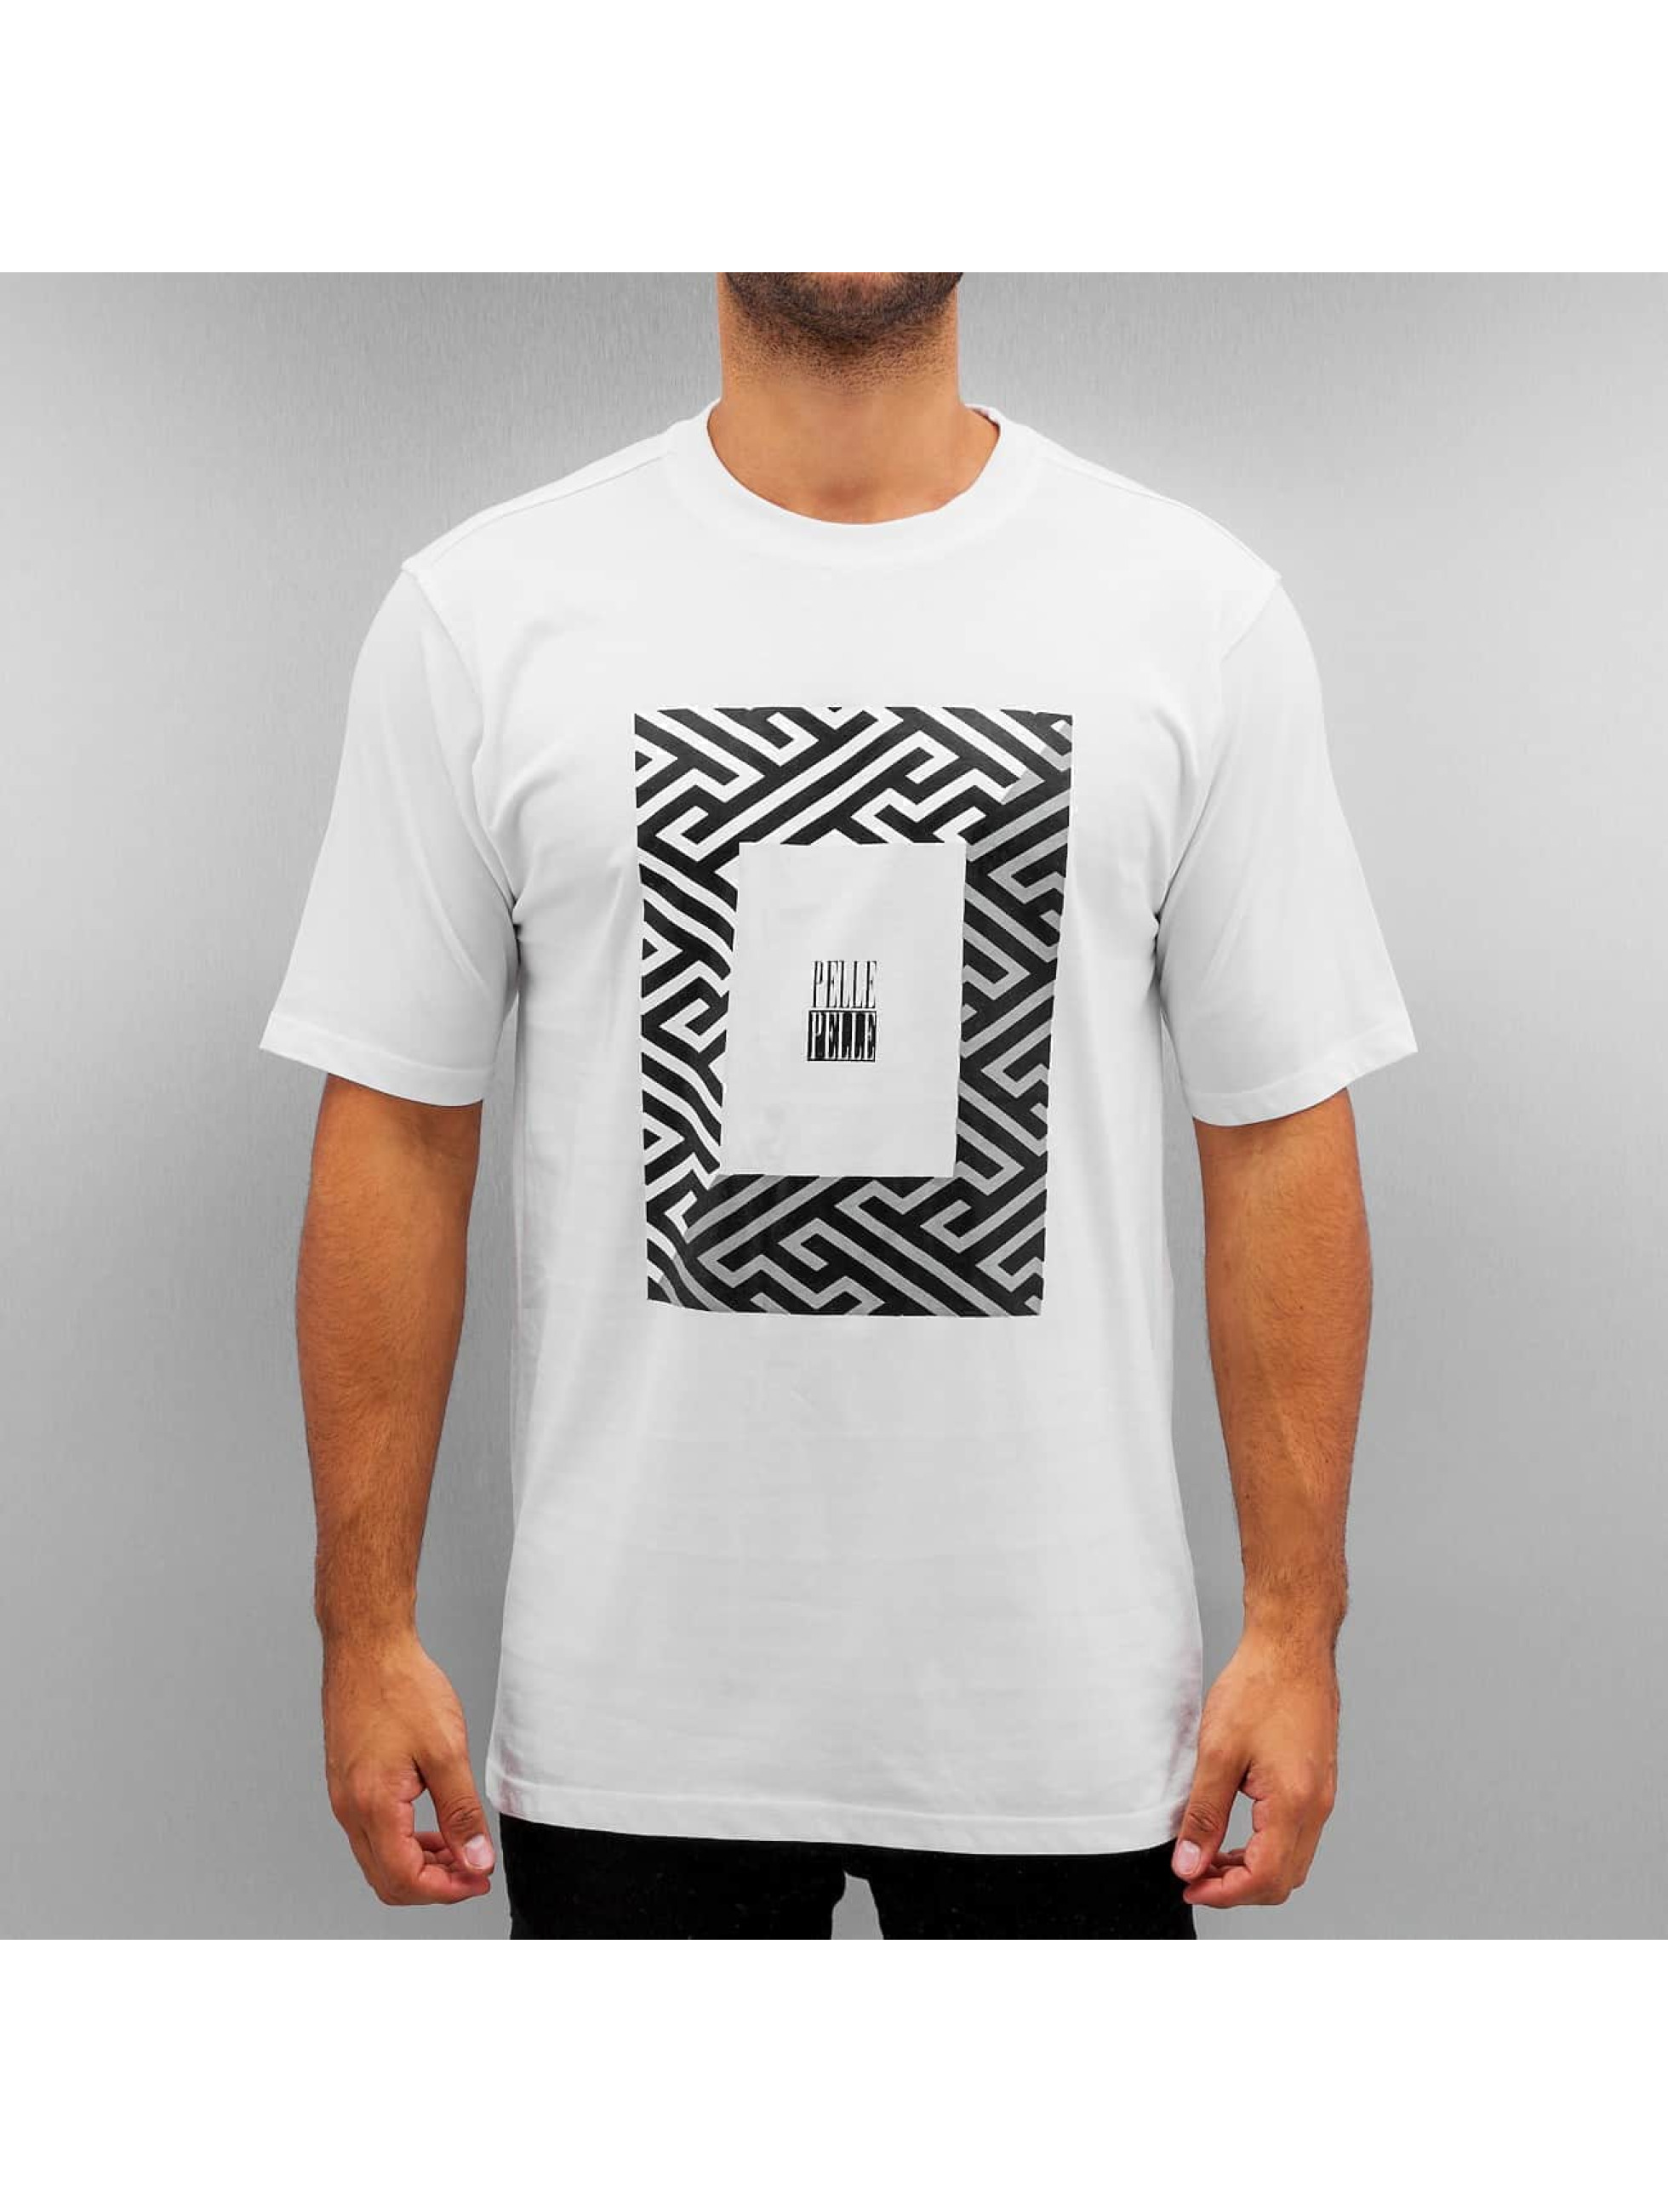 Pelle Pelle T-Shirt 50/50 Dark Maze blanc